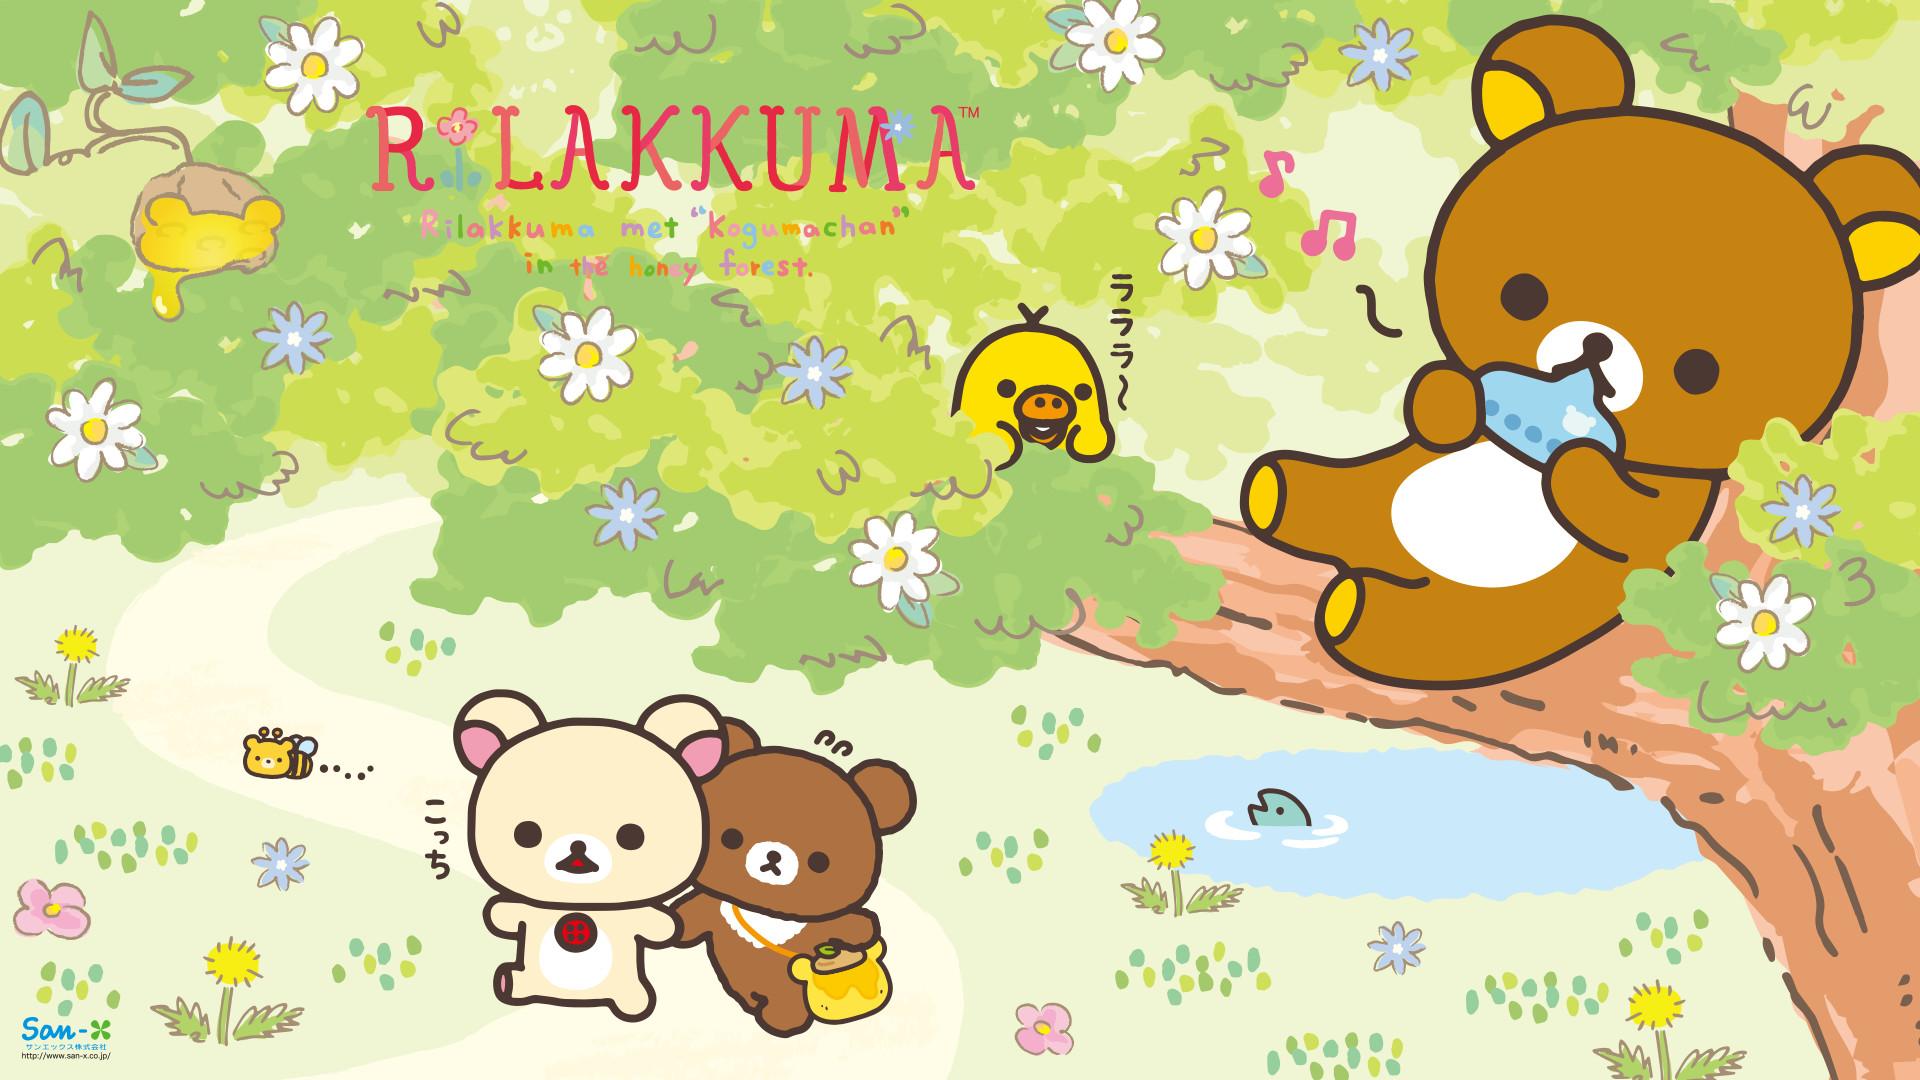 pc_1080_1920.png (1920×1080)   kawaii character   Pinterest   Rilakkuma,  Rilakkuma wallpaper and Wallpaper